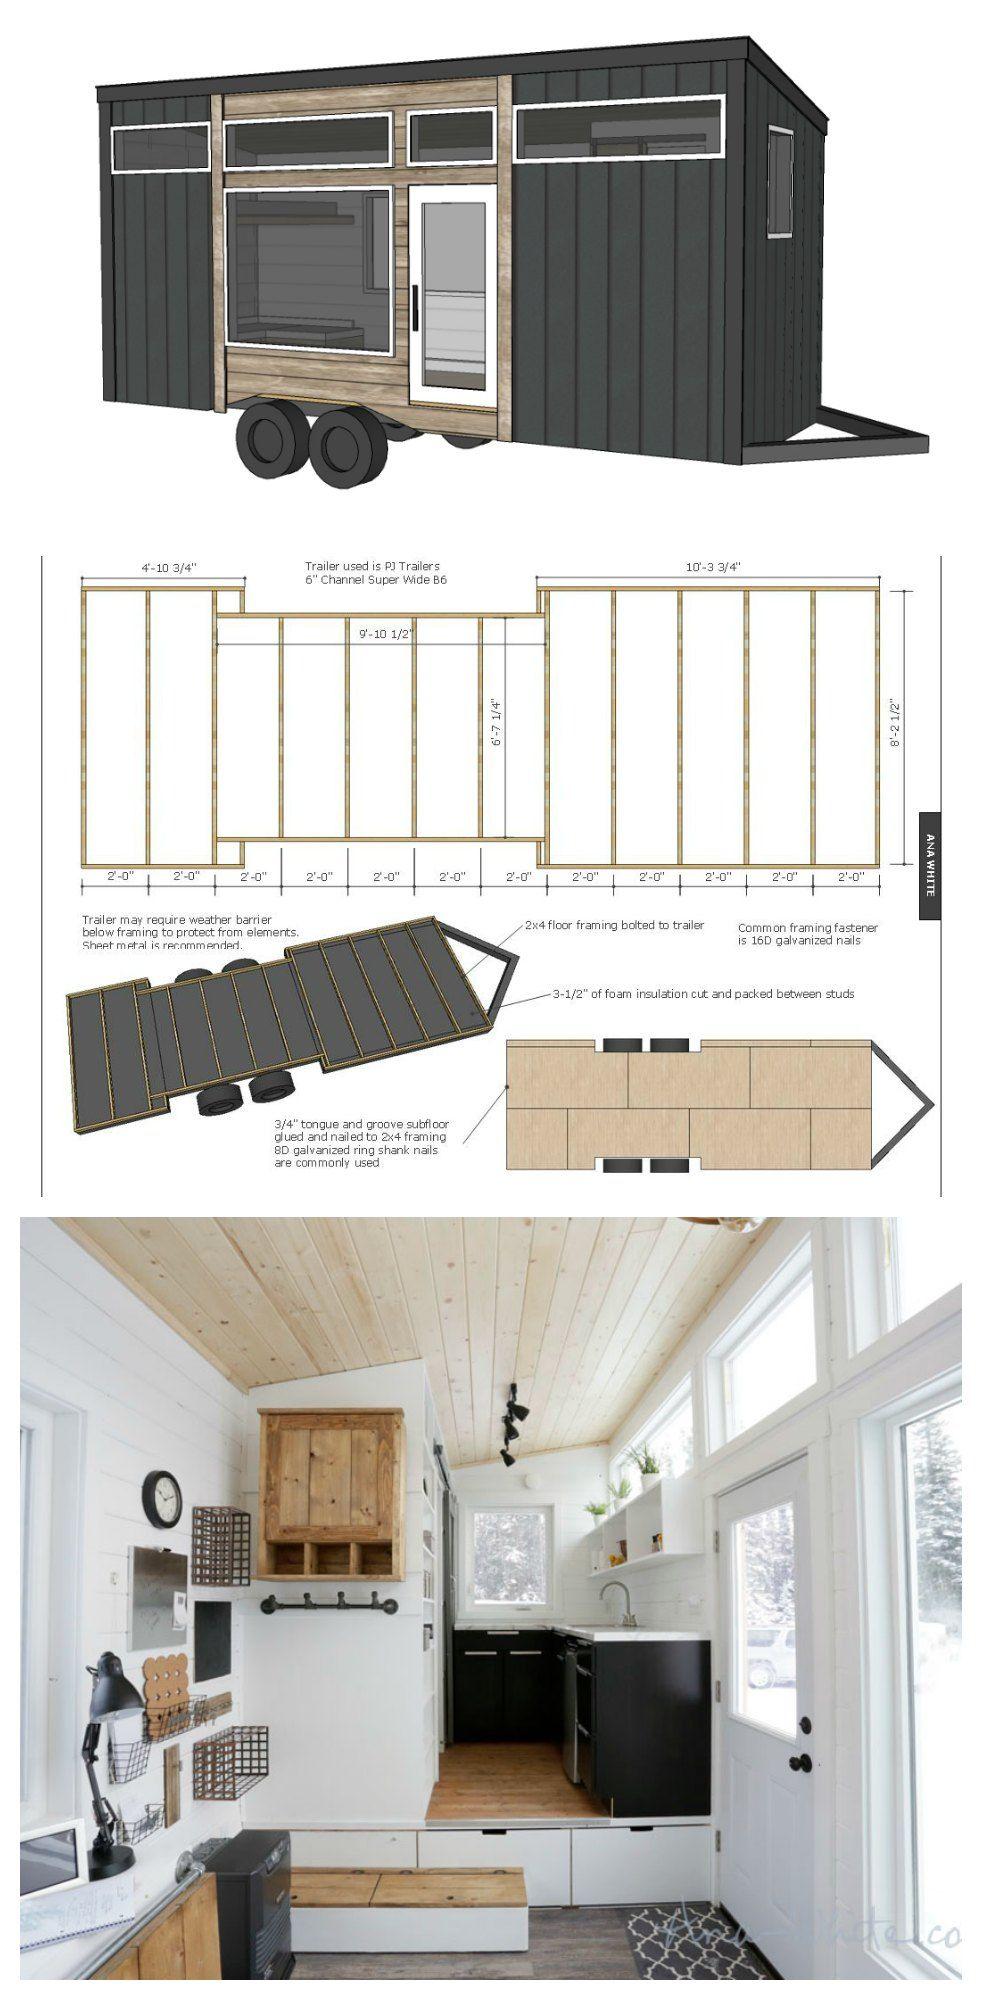 Full framing plans for Ana White\'s Open Concept Rustic Modern Tiny ...